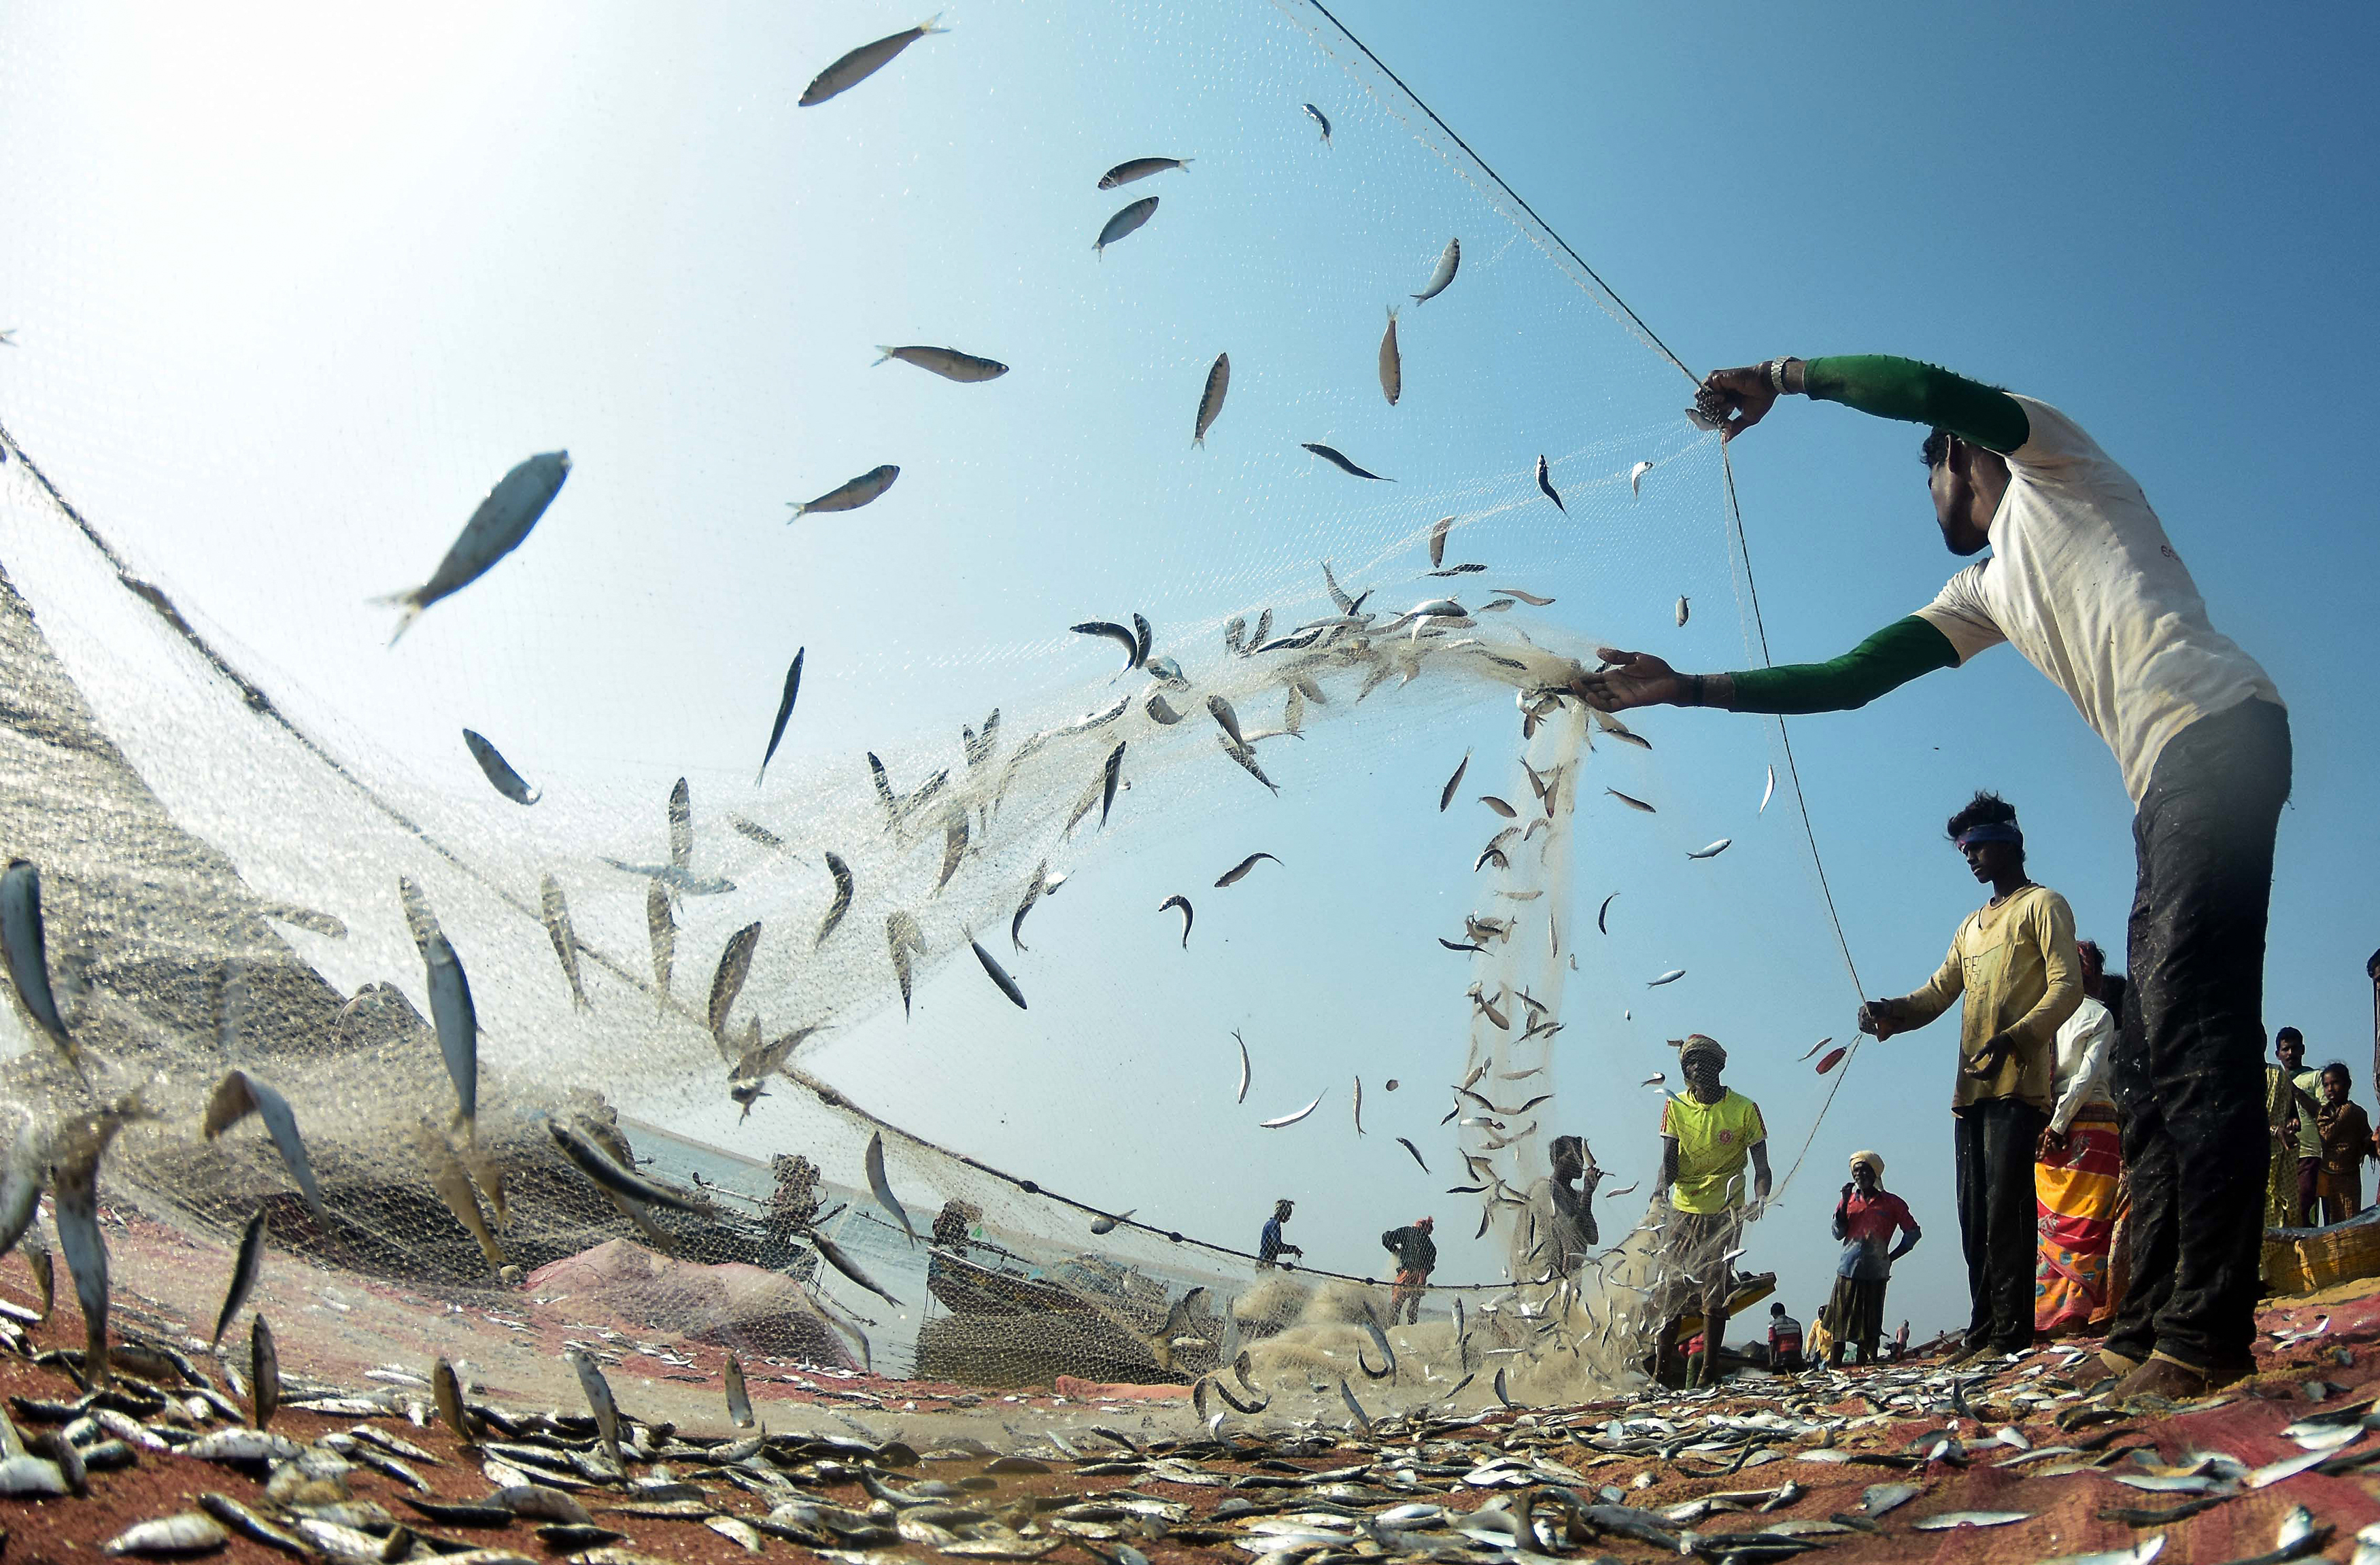 Fishermen Caught in India-Pakistan Conflict